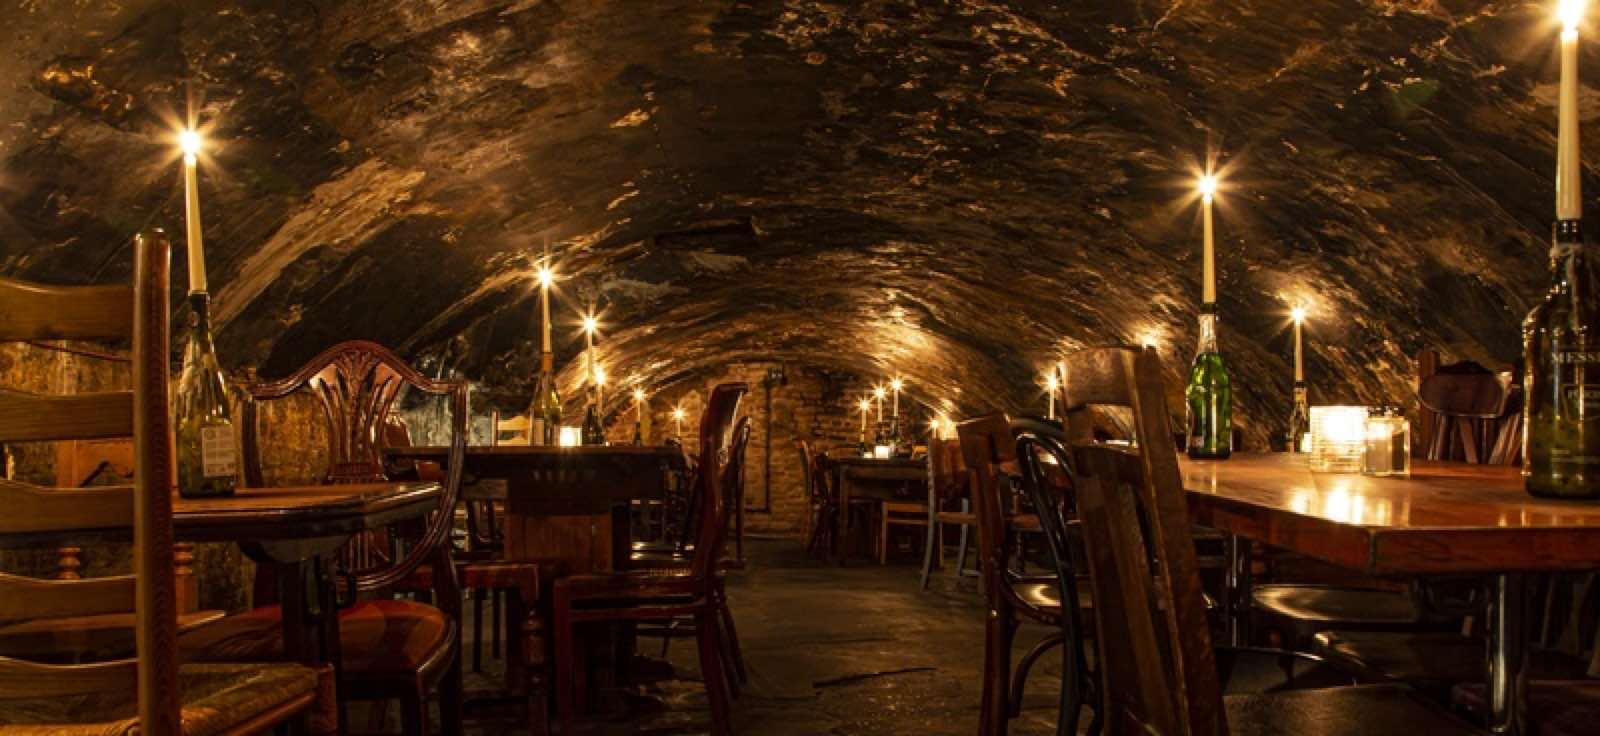 Gordon's Wine Bar close to Covent Garden is unique